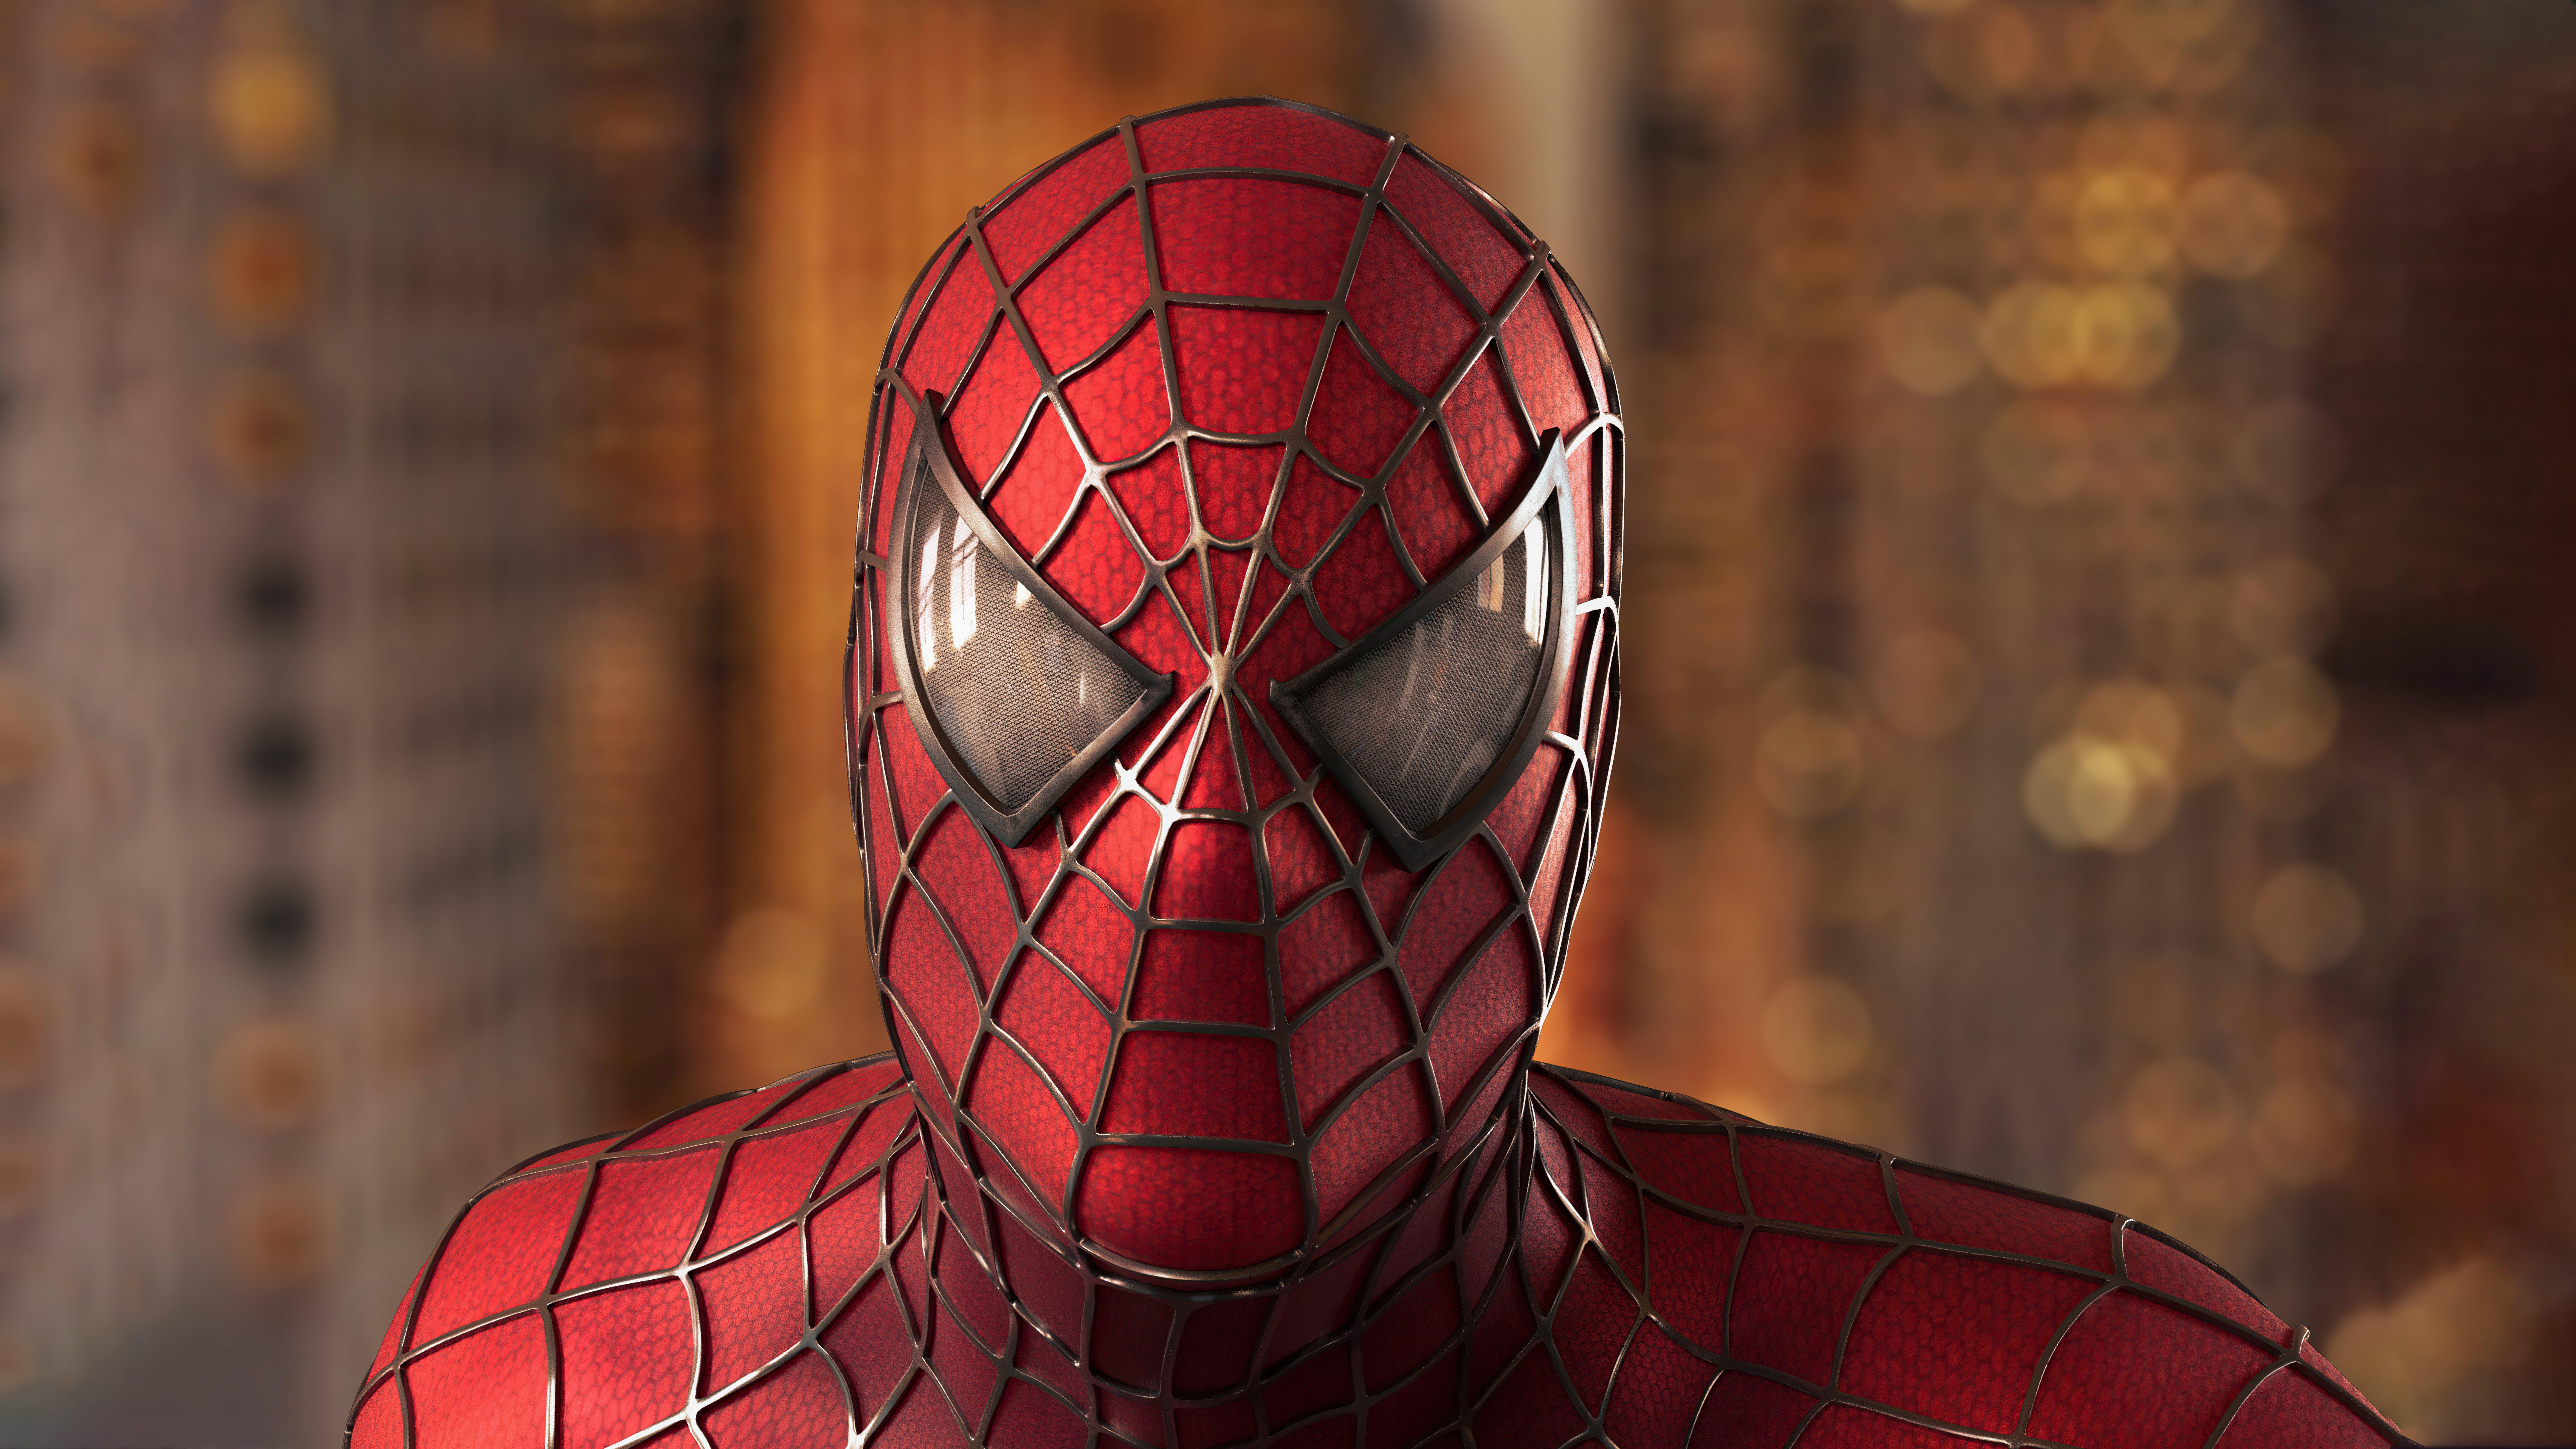 Fondos de pantalla El Hombre Araña